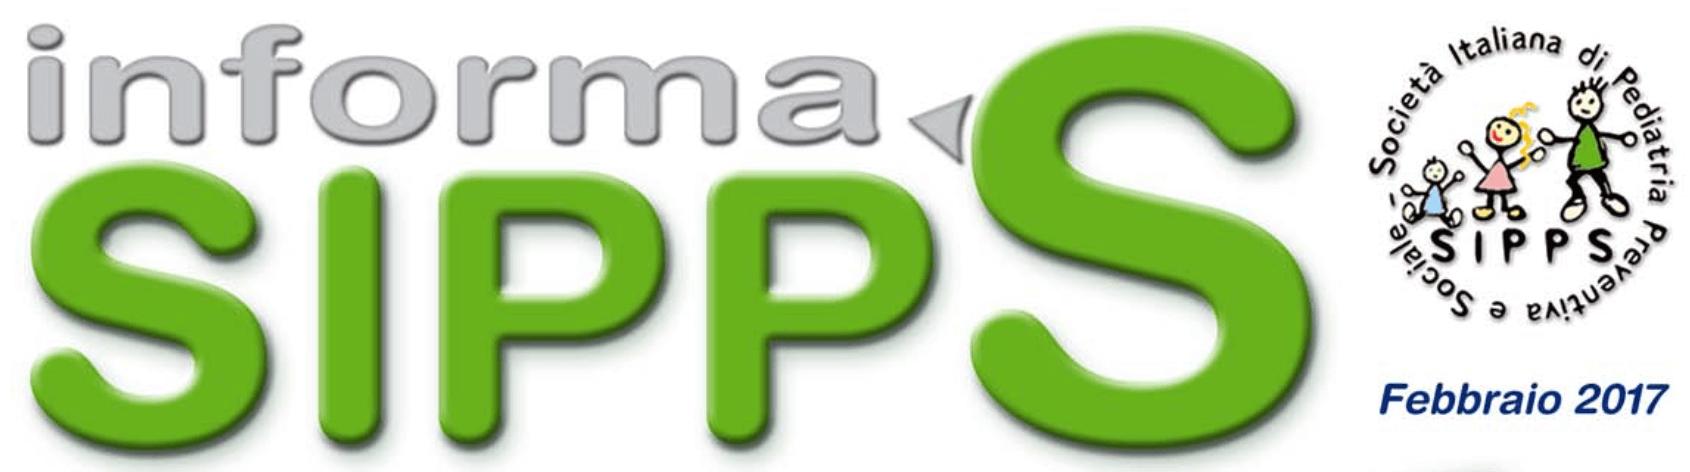 SippsInforma Febbraio 2017